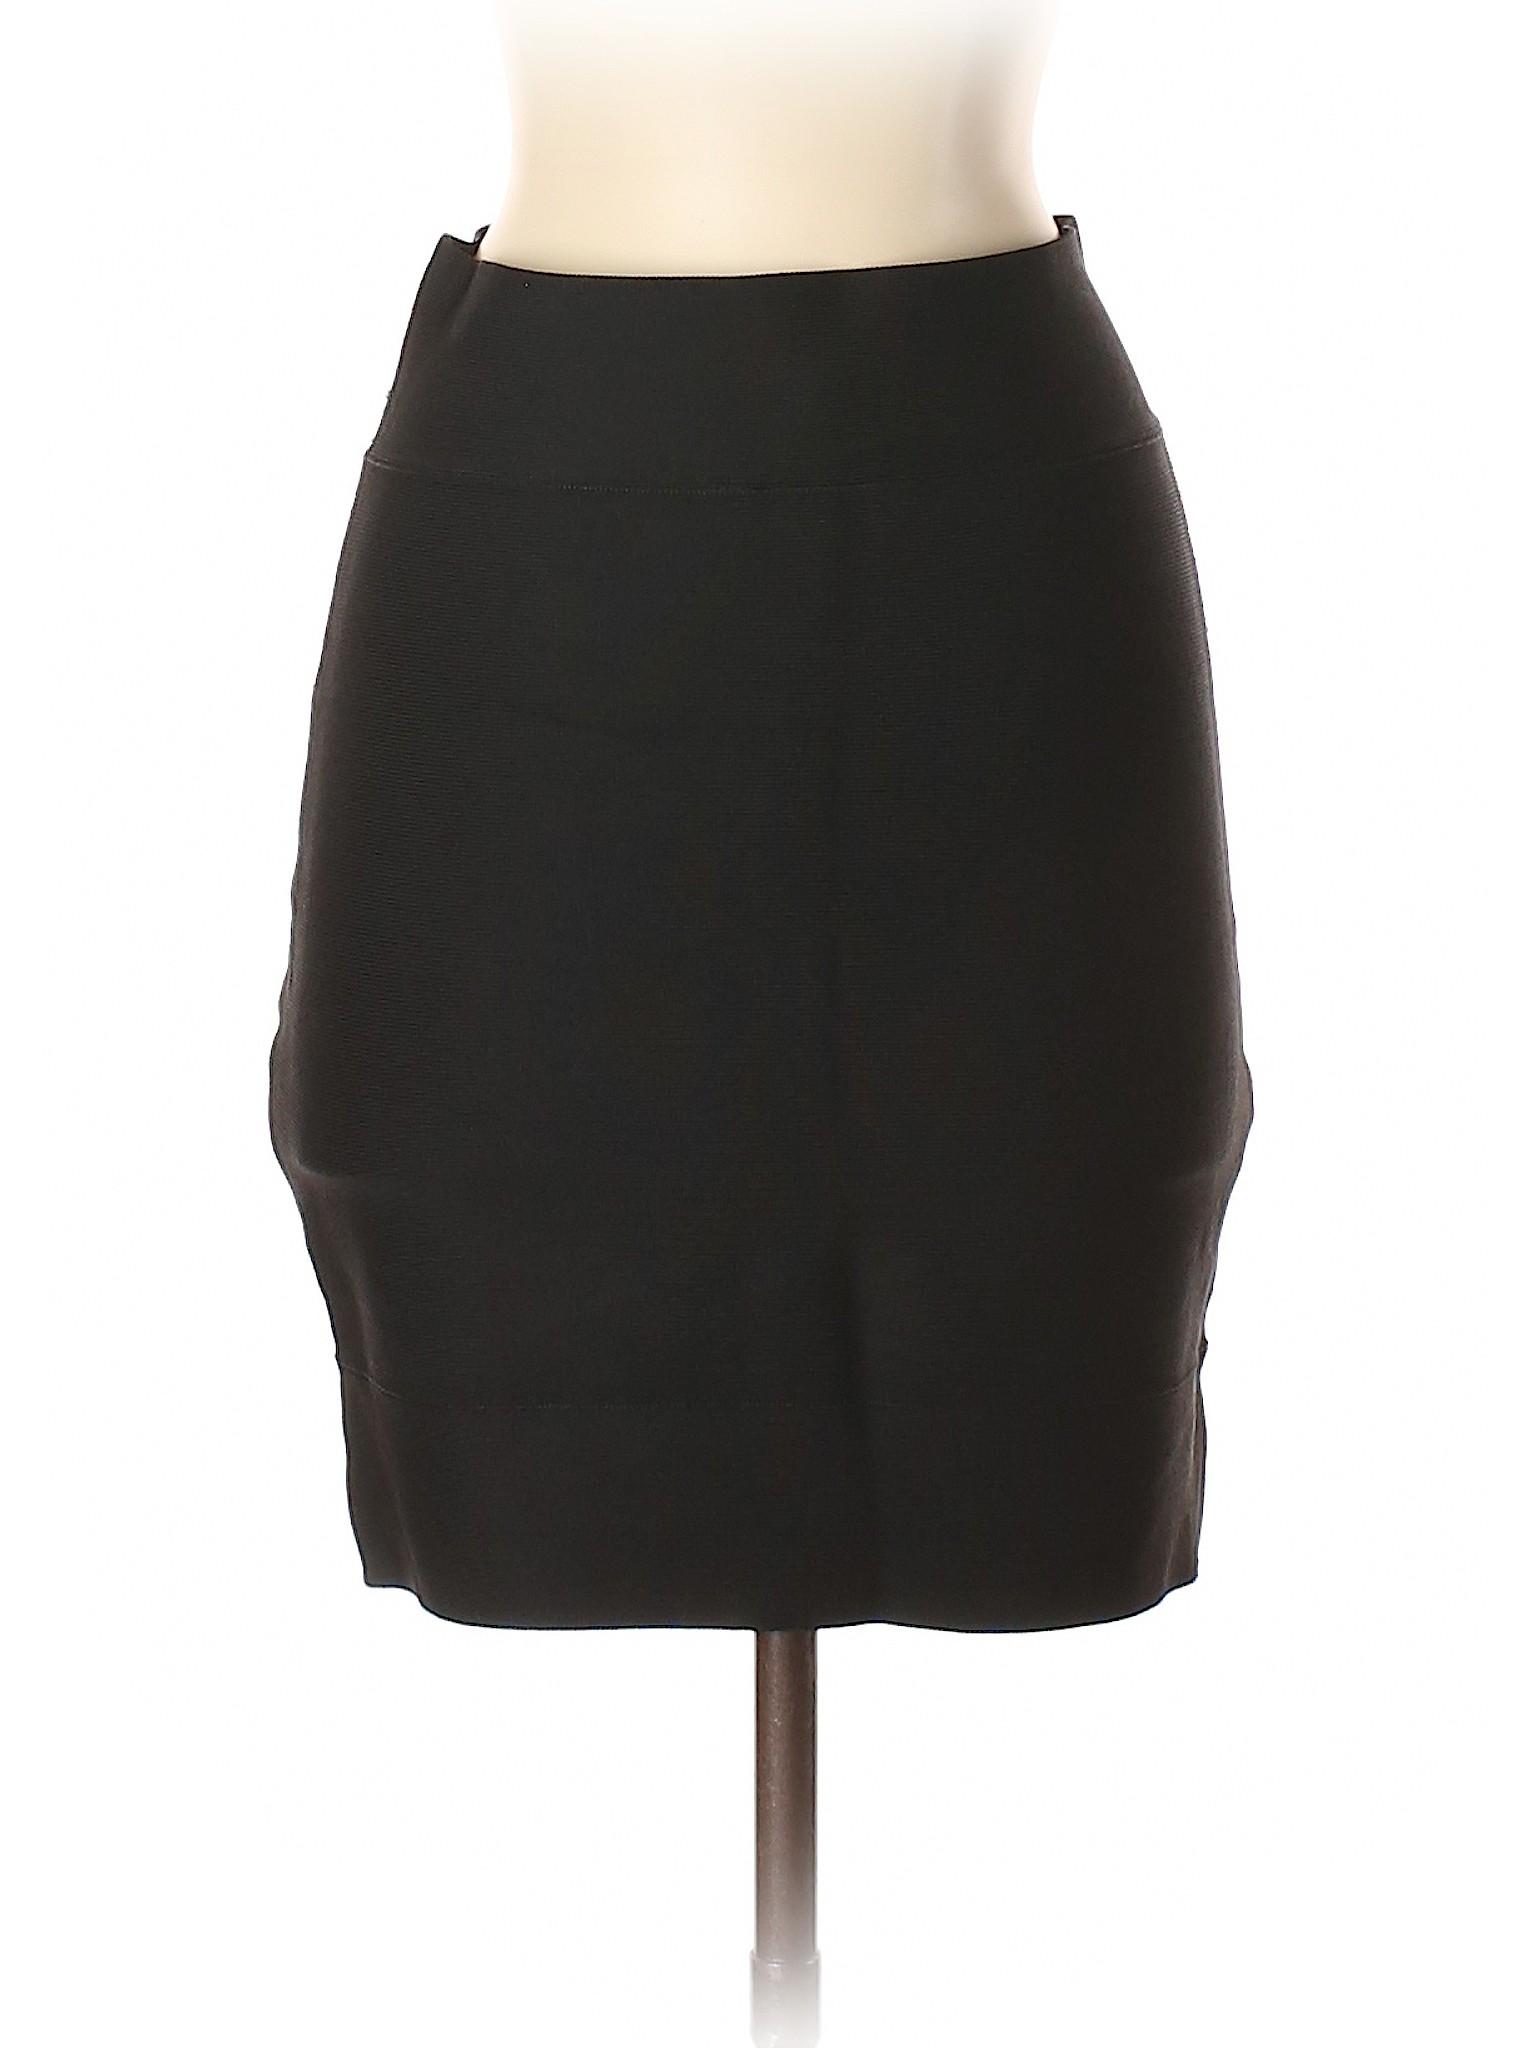 Skirt Skirt Casual winter winter BCBGMAXAZRIA Skirt Leisure winter BCBGMAXAZRIA winter BCBGMAXAZRIA Casual Leisure Casual Leisure Leisure Taaw1nx